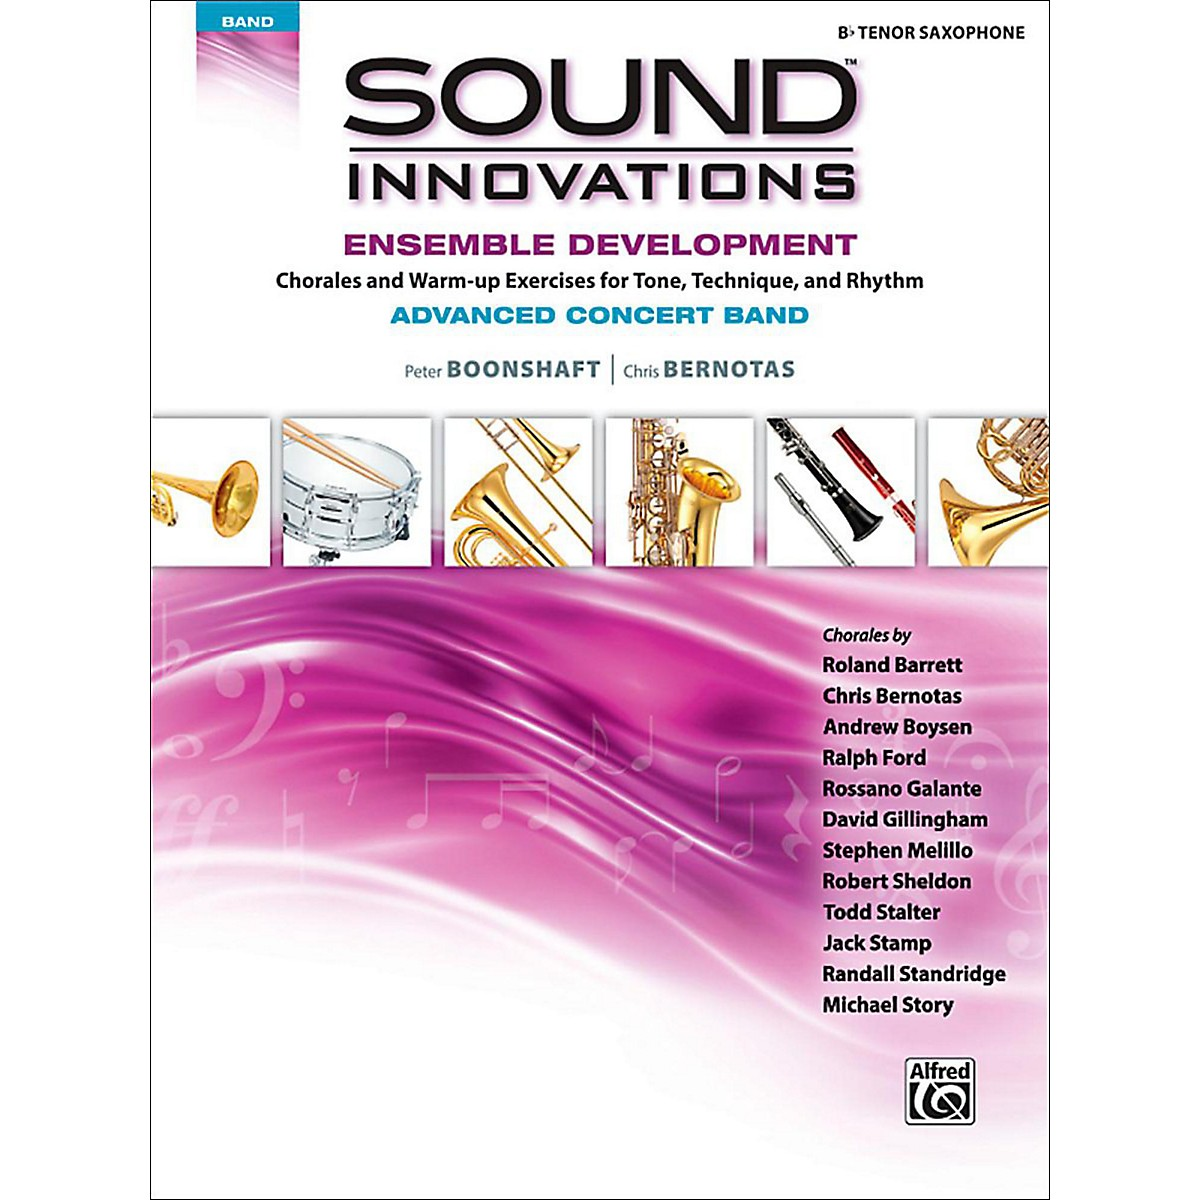 Alfred Sound Innovations Concert Band Ensemble Development Advanced Tenor Saxophone